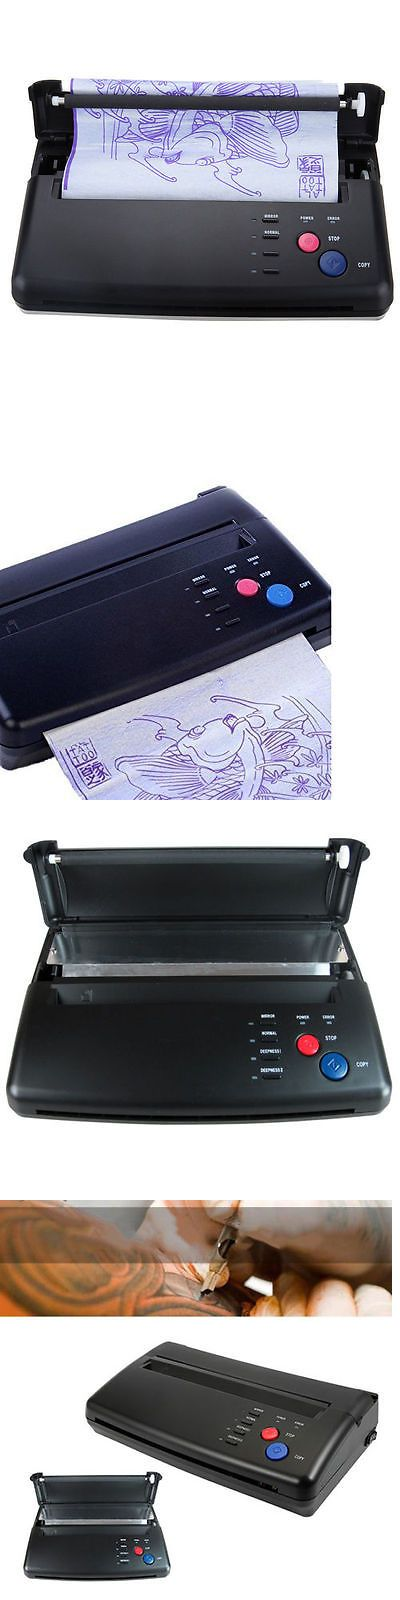 Tattoo Supplies: New Tattoo Stencil Maker Transfer Machine Flash Thermal Copier Printer Supplies -> BUY IT NOW ONLY: $119.98 on eBay!